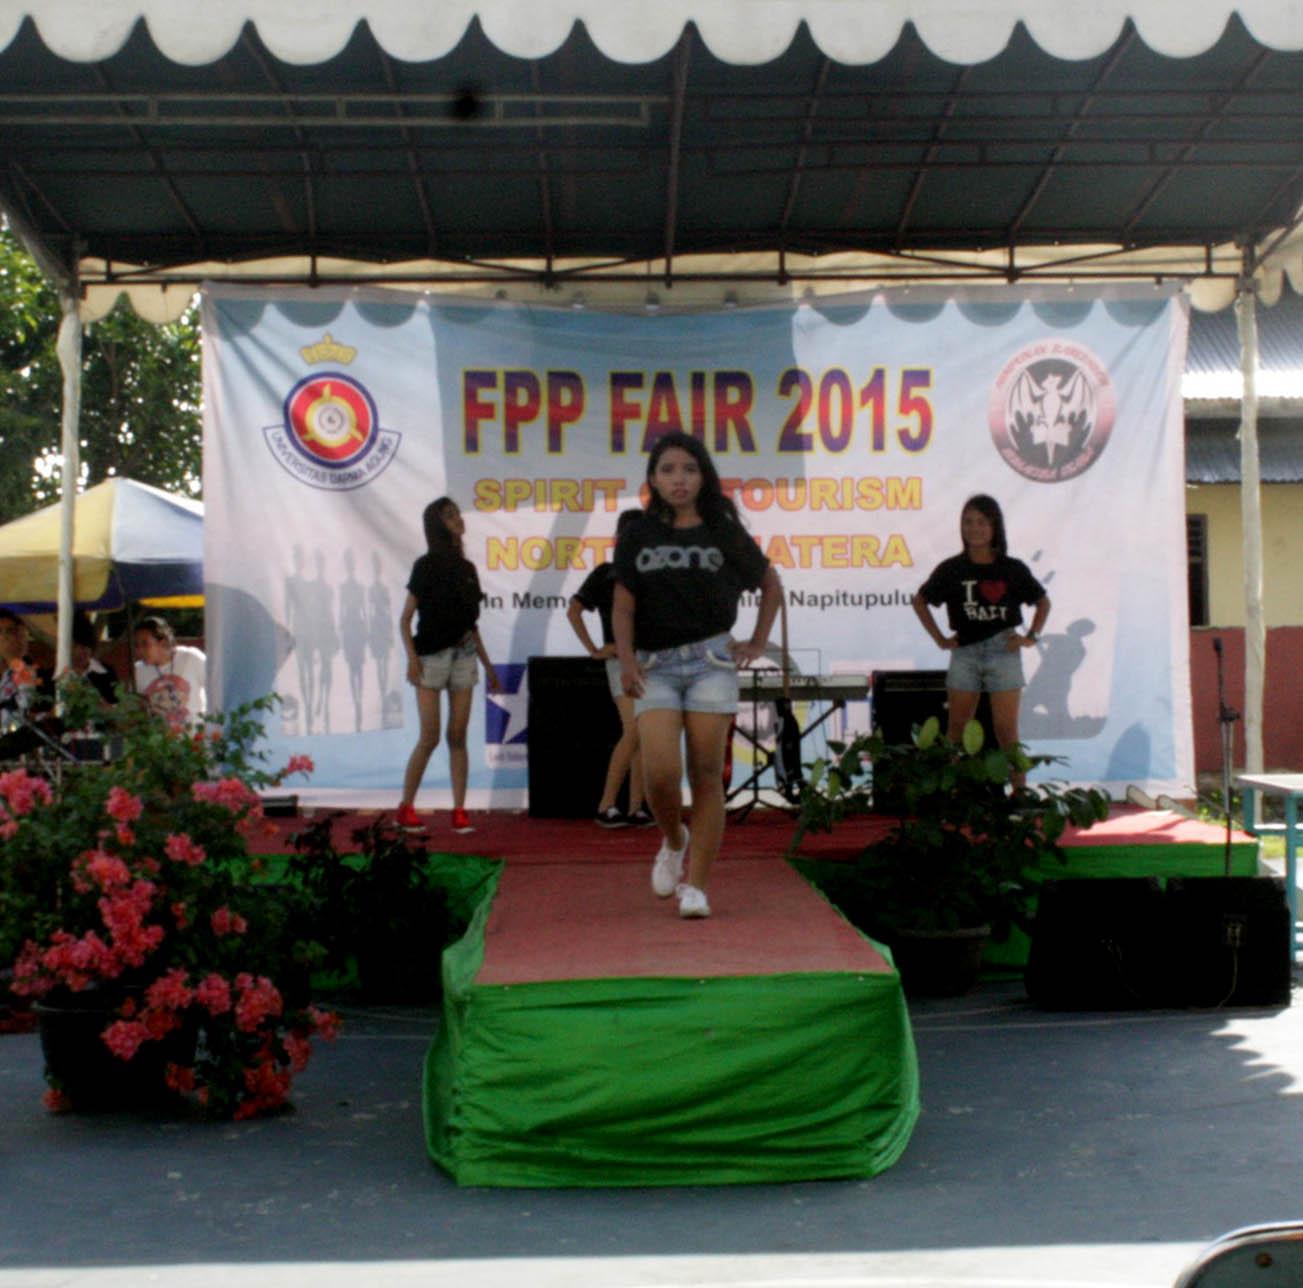 PESERTA MODEL FPP FAIR 2015